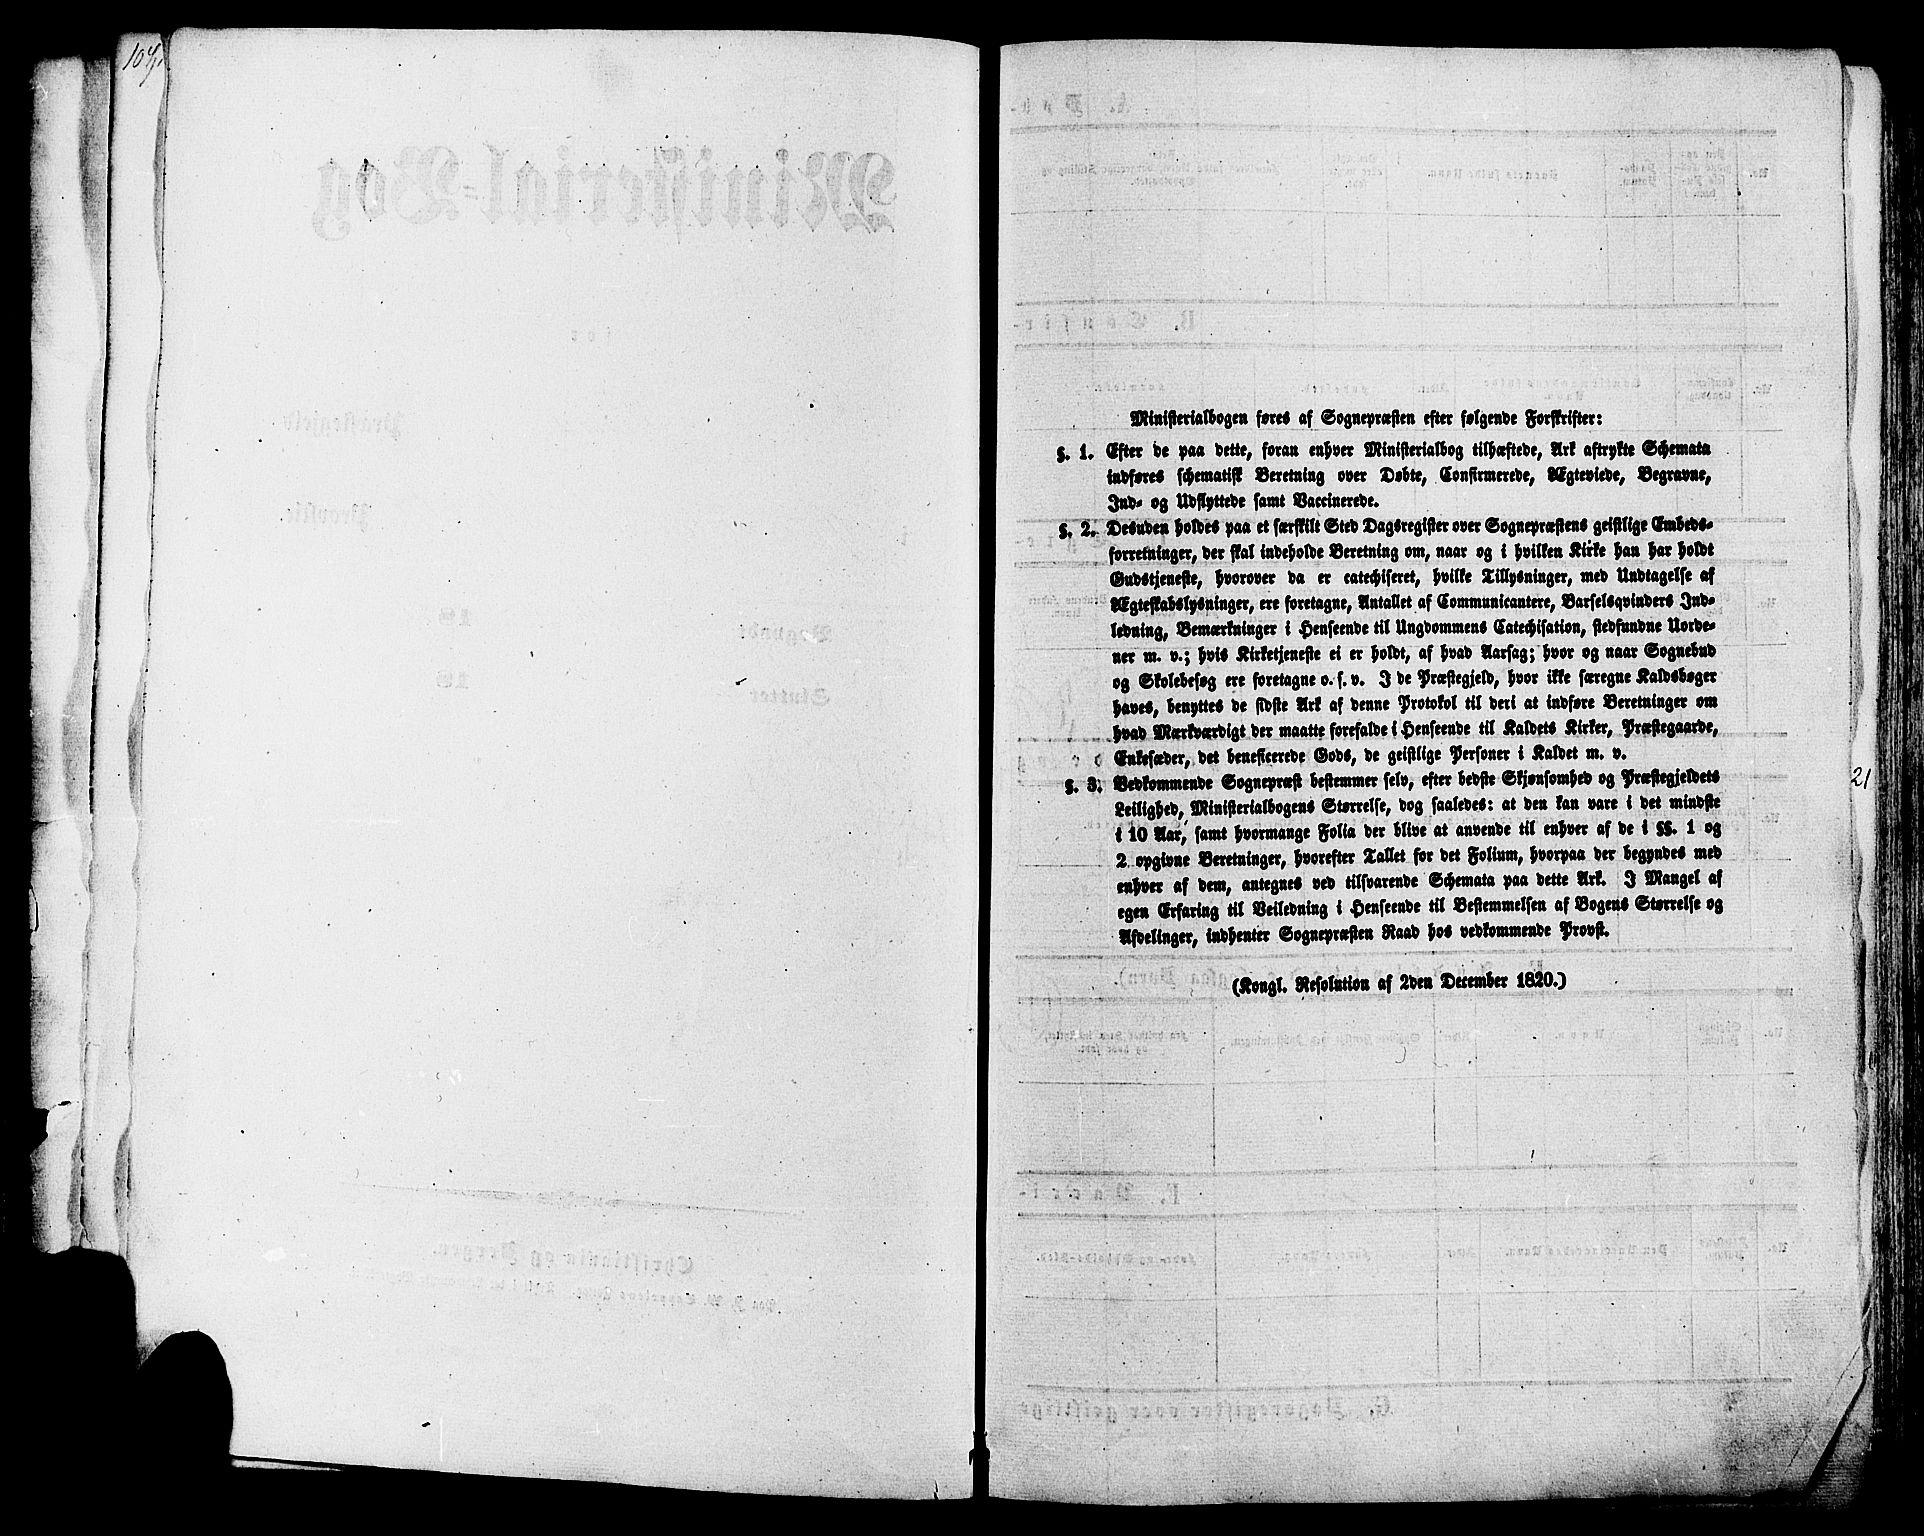 SAKO, Tinn kirkebøker, F/Fa/L0006: Ministerialbok nr. I 6, 1857-1878